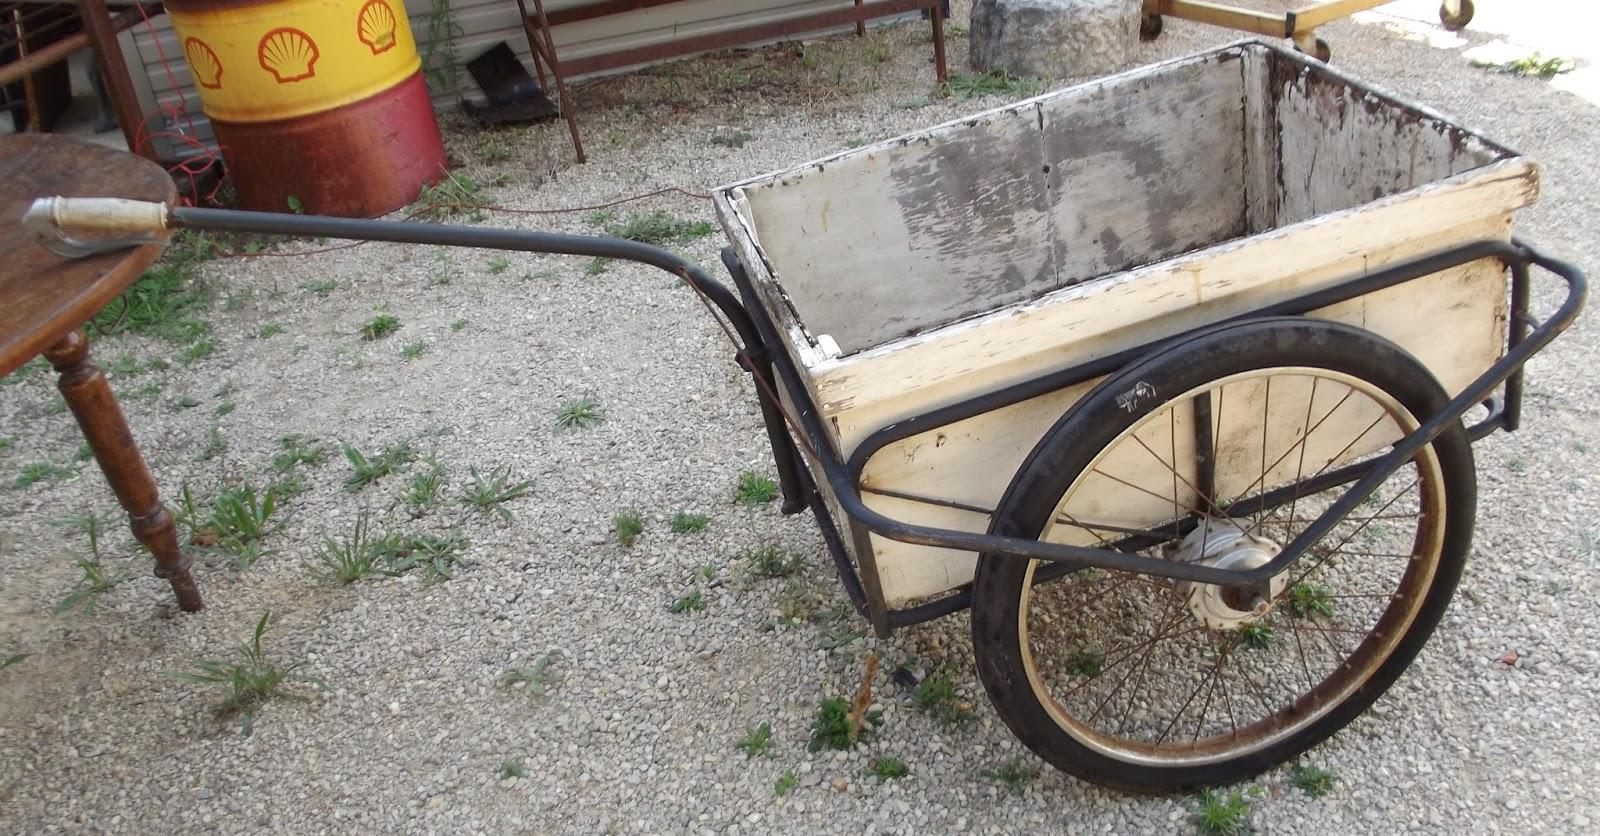 art populaire carriole roue freins tambour v lo solex remorque charrette ancien ebay. Black Bedroom Furniture Sets. Home Design Ideas